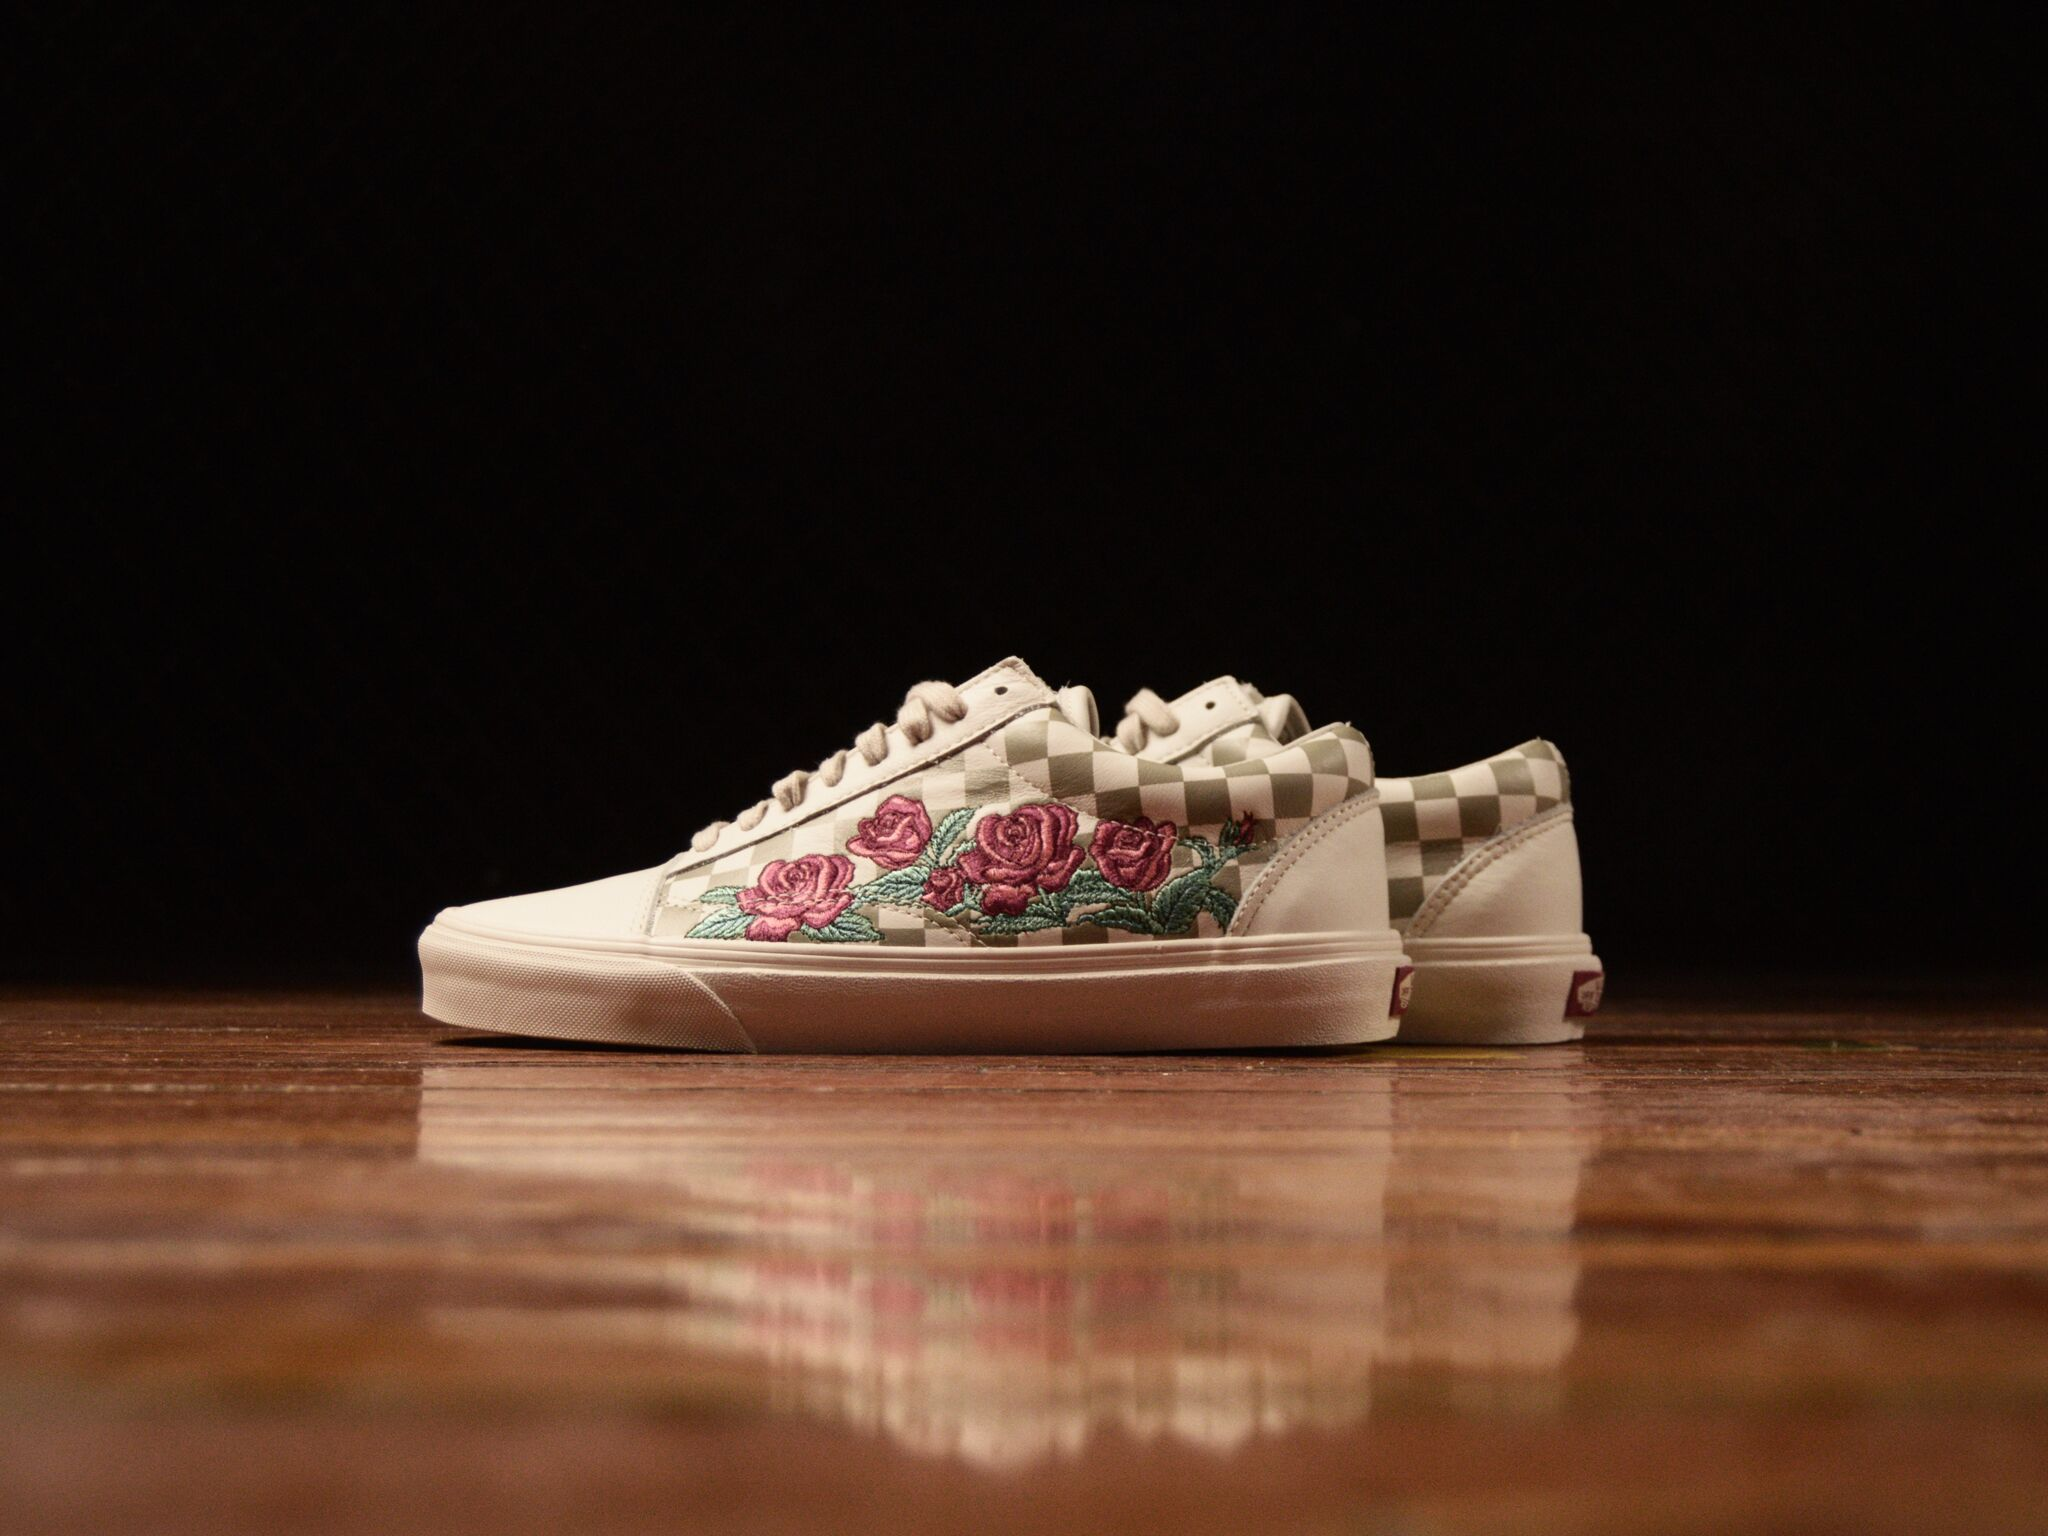 Men s Vans Old Skool DX  Rose Embroidery   VN0A38G3QF9   95fcd80c2